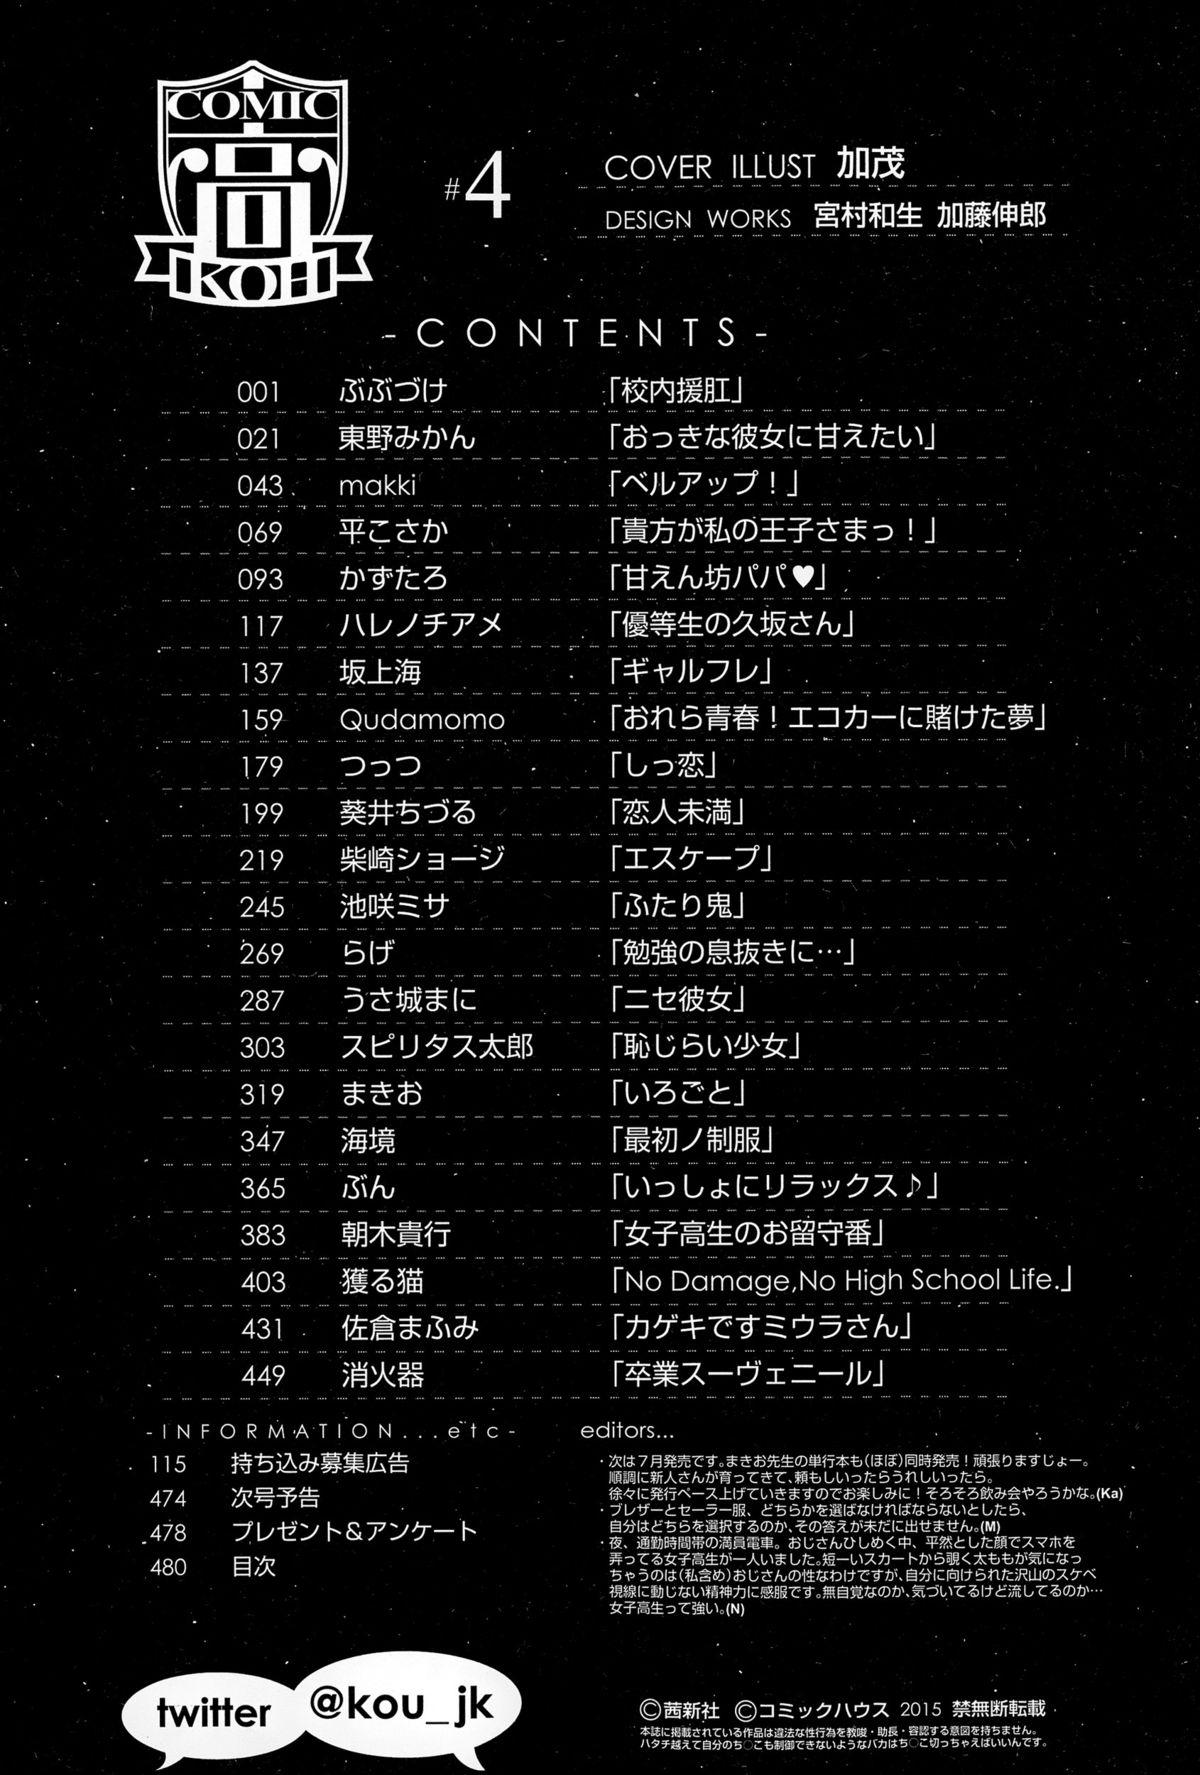 COMIC Koh Vol.4 481